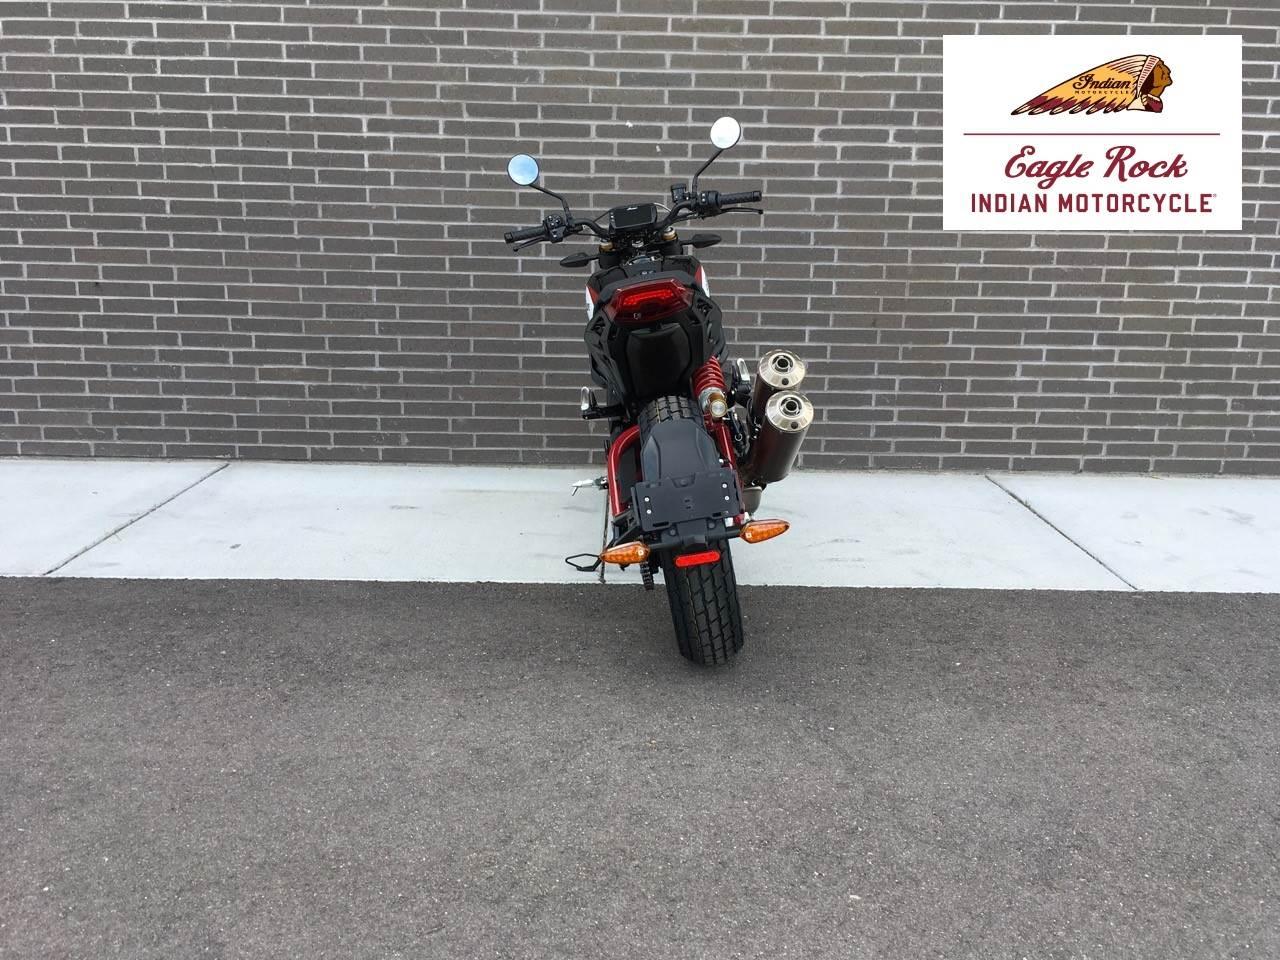 New 2019 Indian FTR™ 1200 S Motorcycles In Idaho Falls, ID